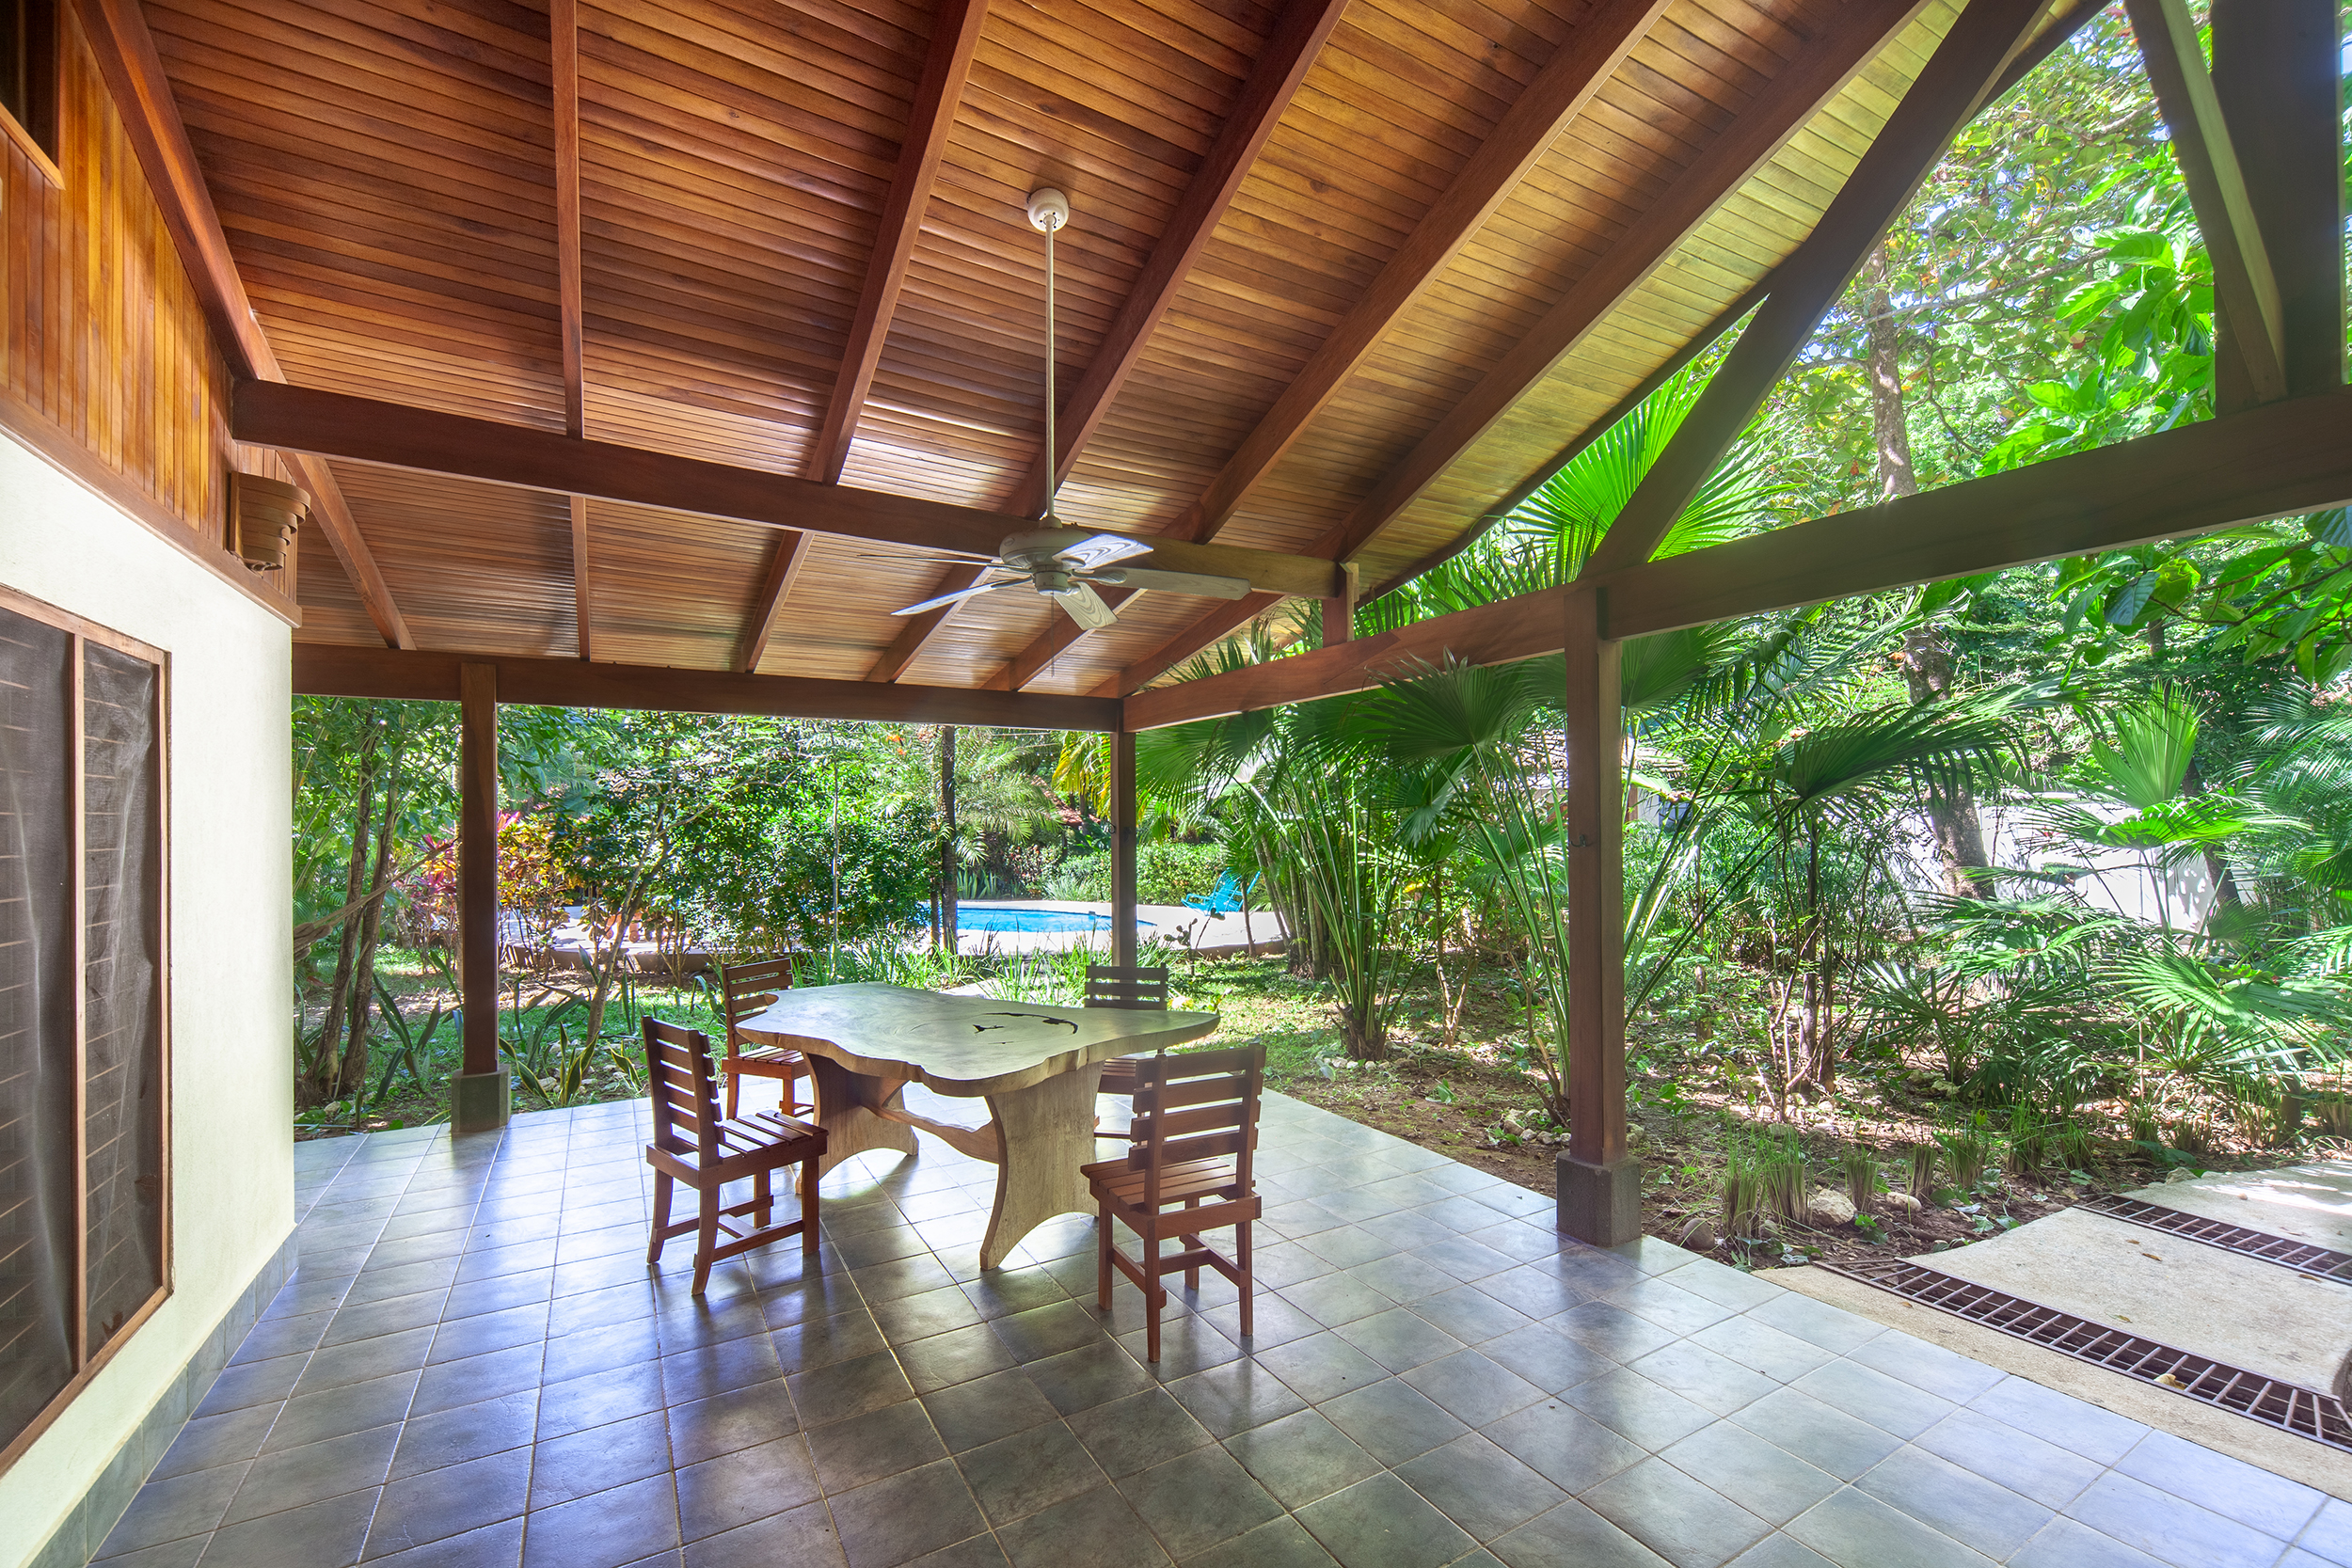 LOW - Casa las Brisas -  Jardines018.jpg